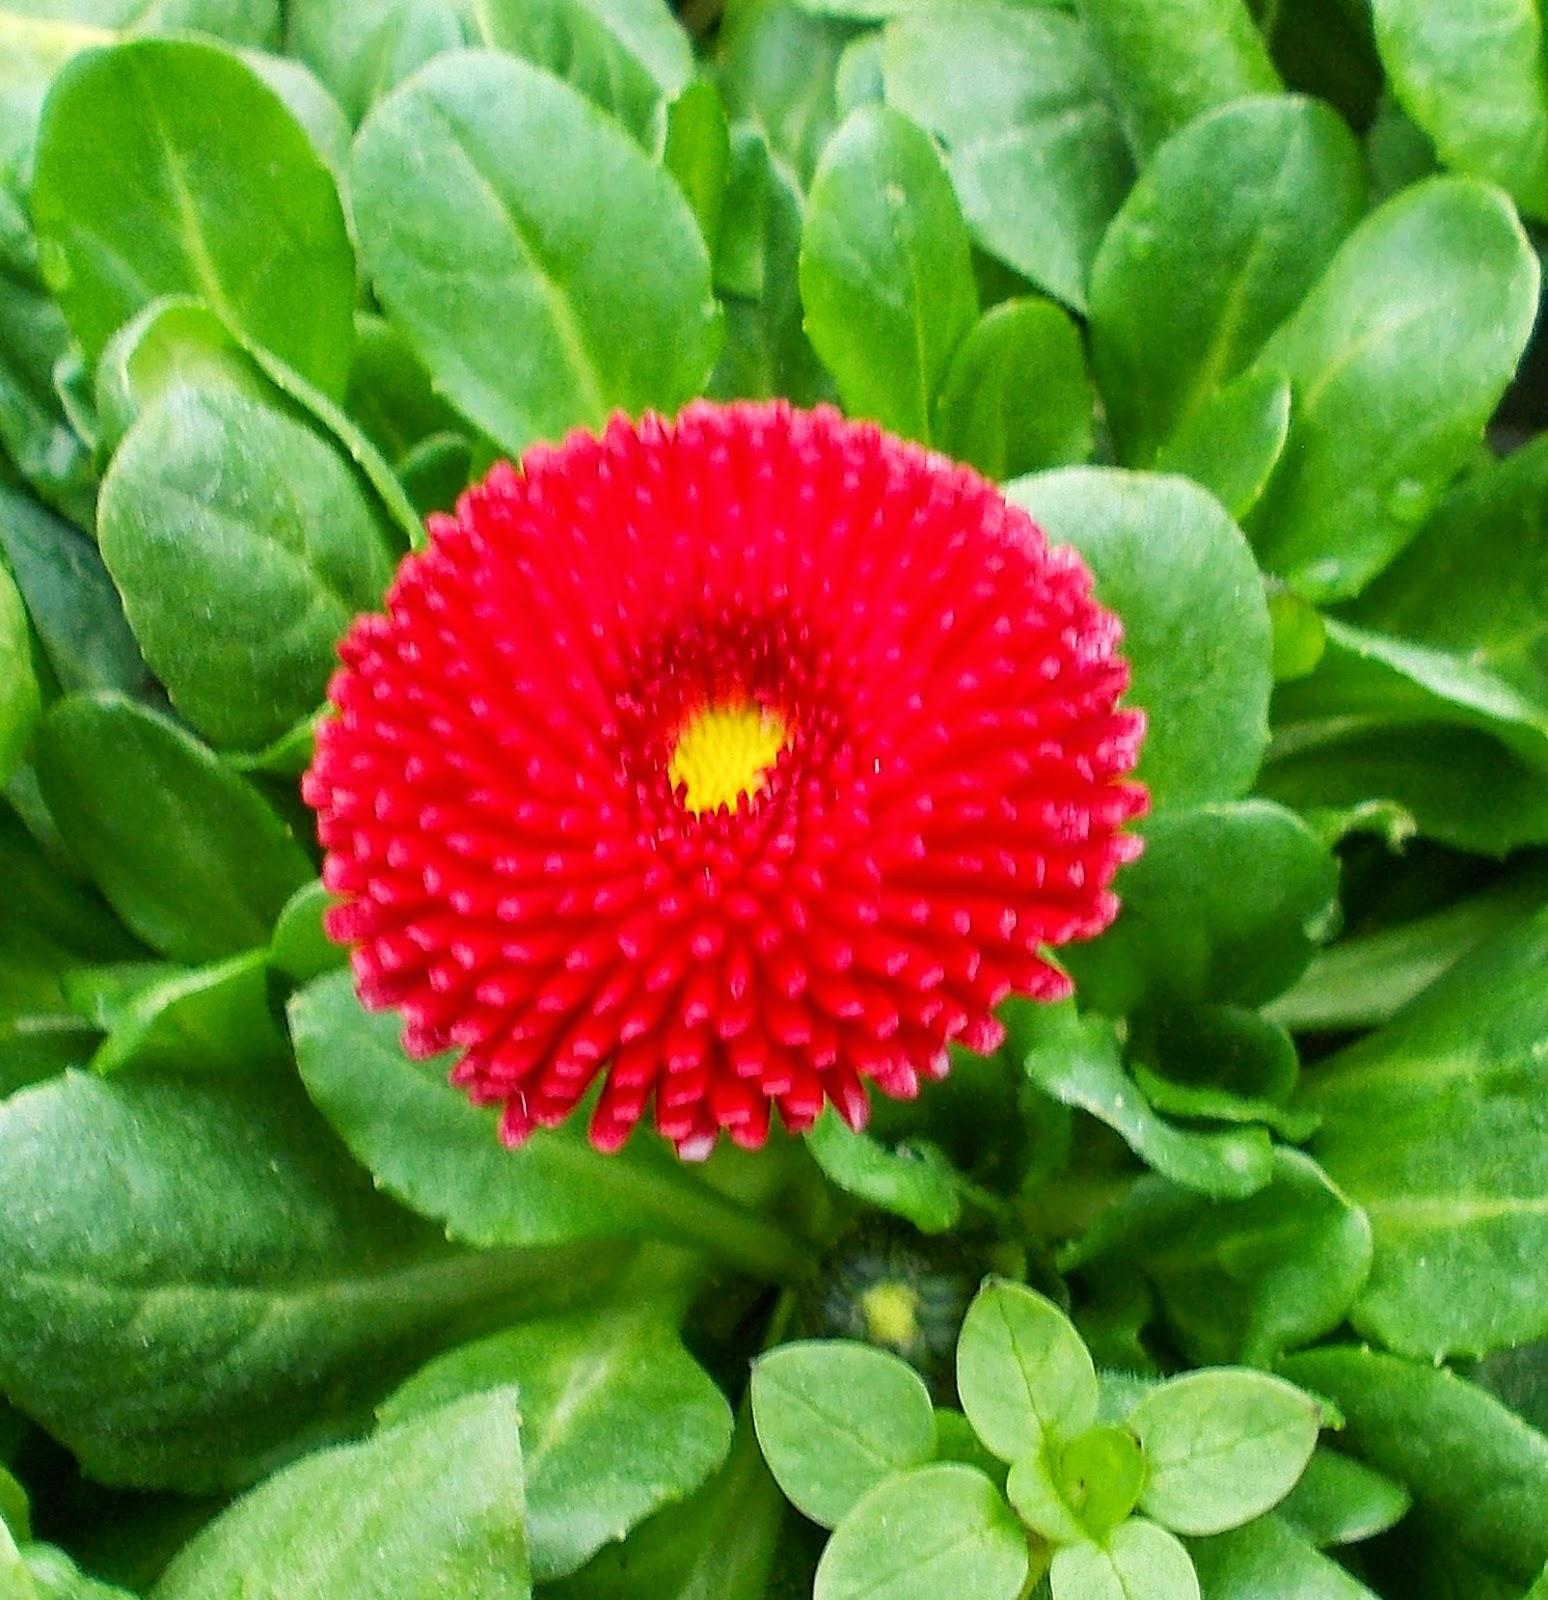 Flori Balta Doamnei Ochiul Boului